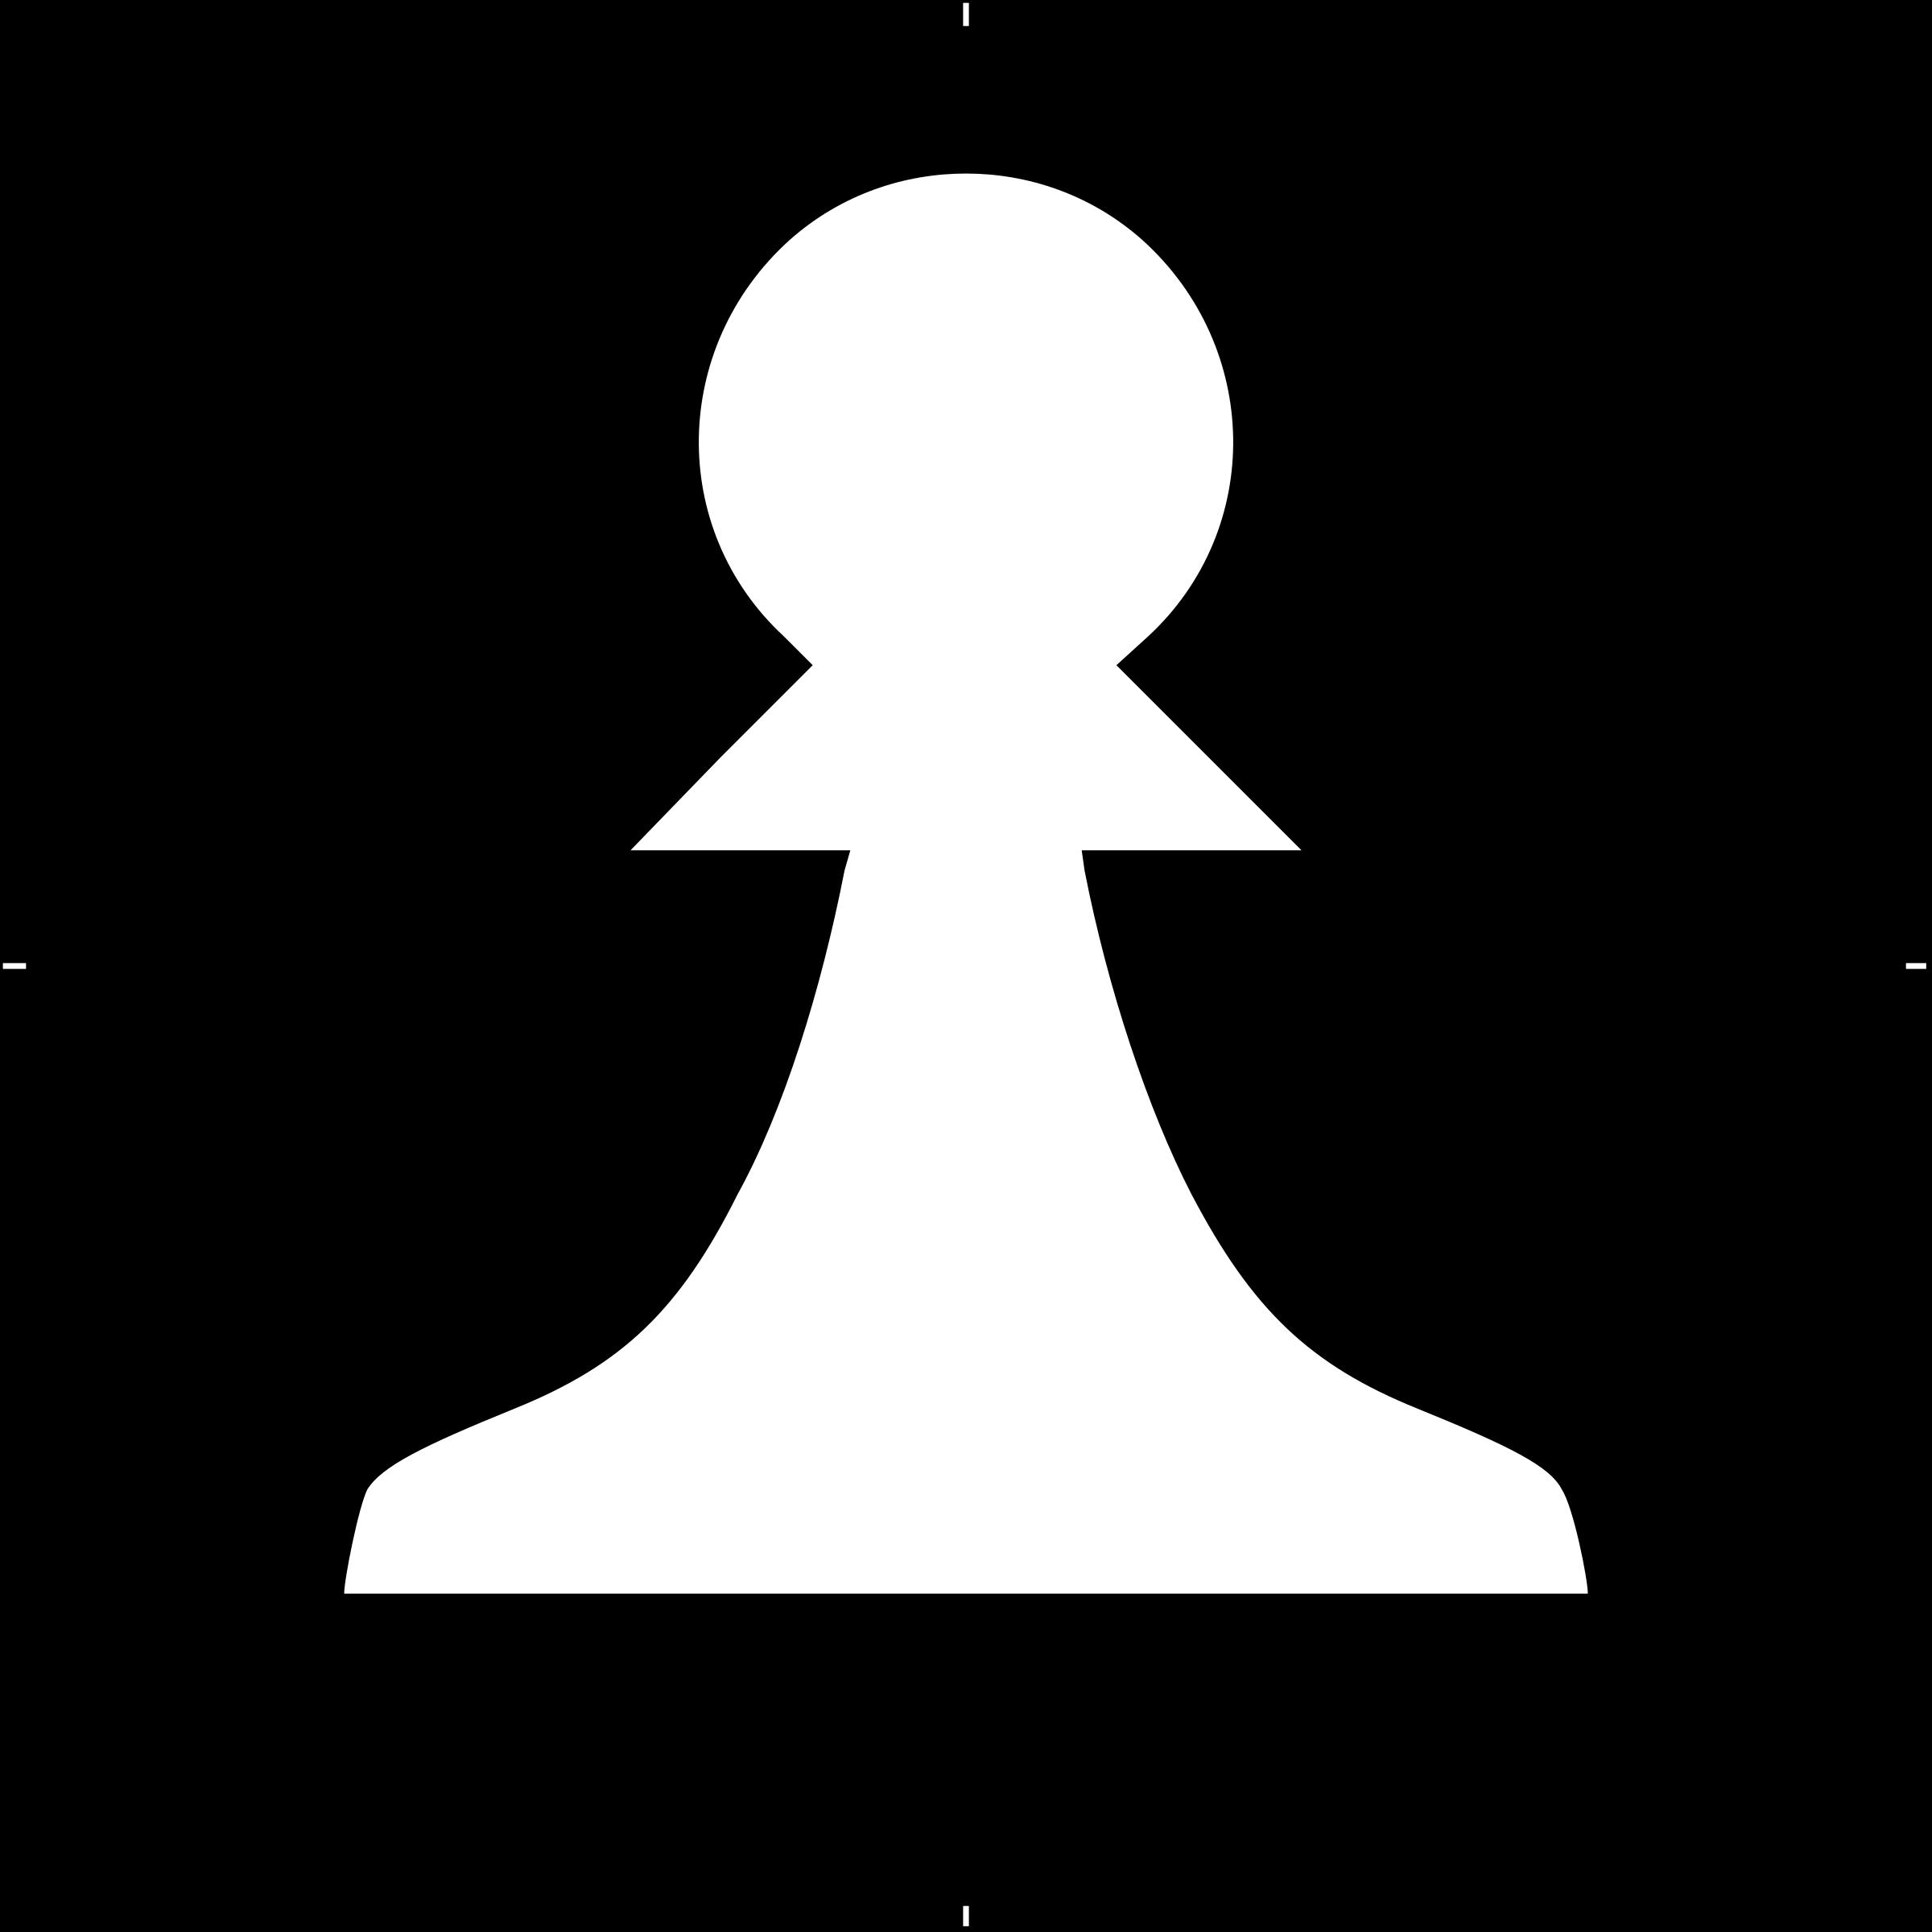 Writer clipart peon. Chess piece symbol white